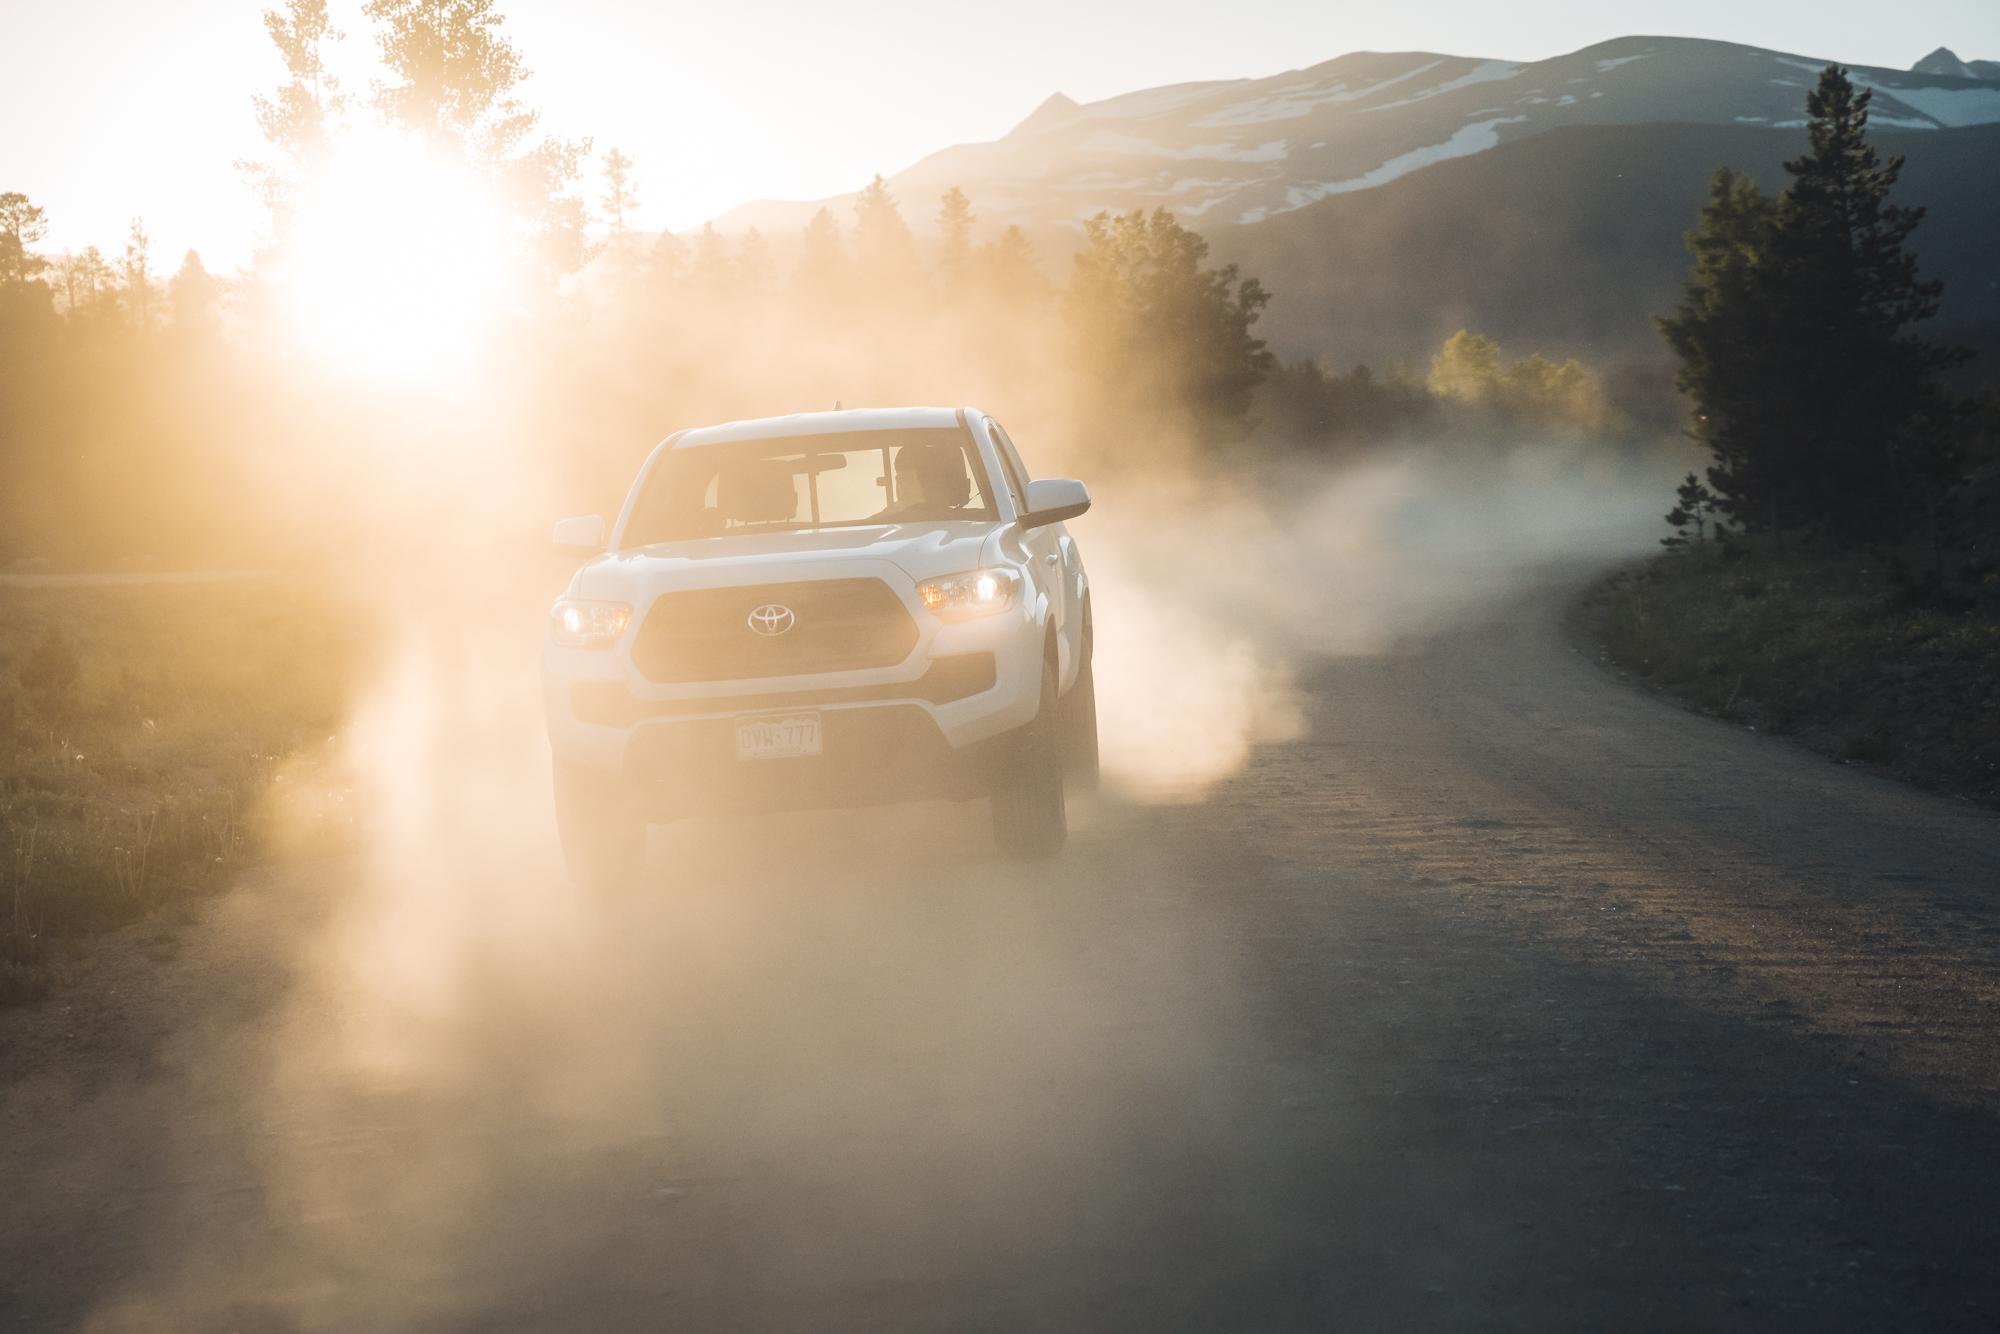 Toyota Tacoma-7.jpg